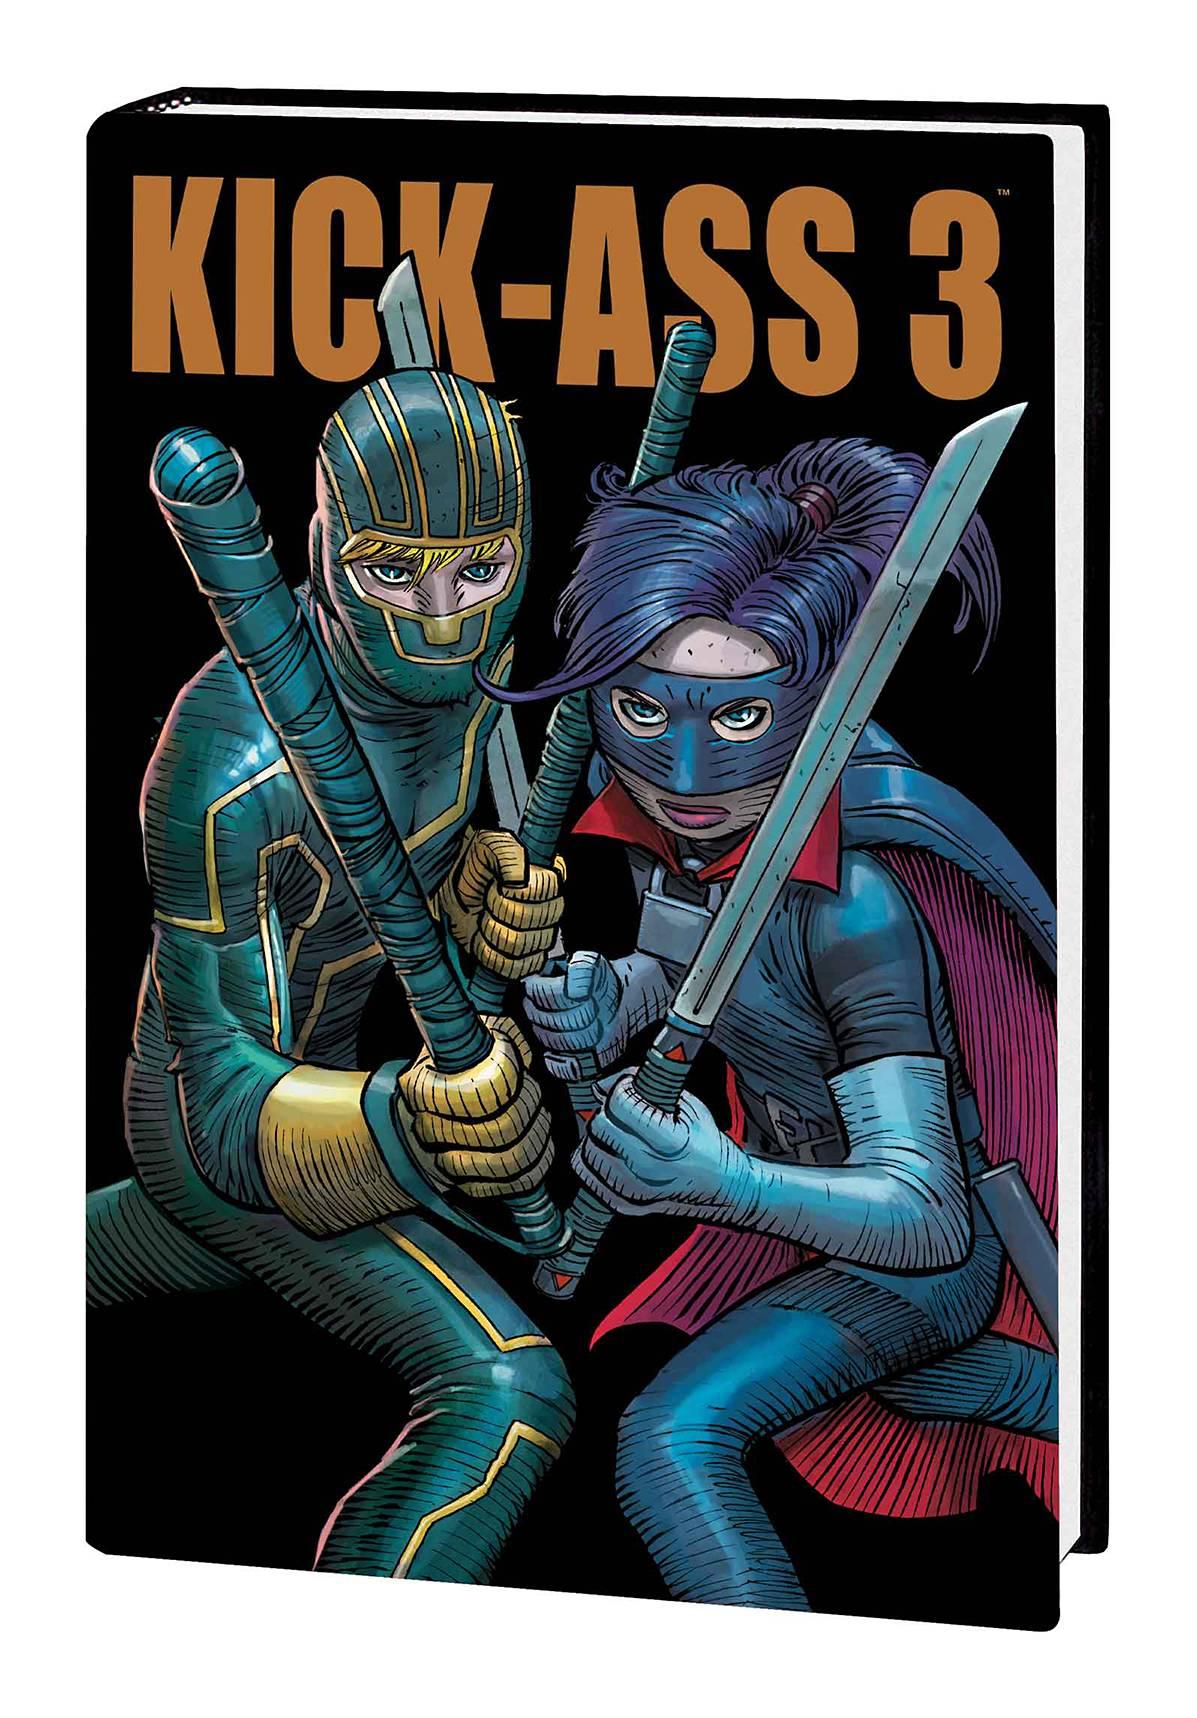 Kickass 3